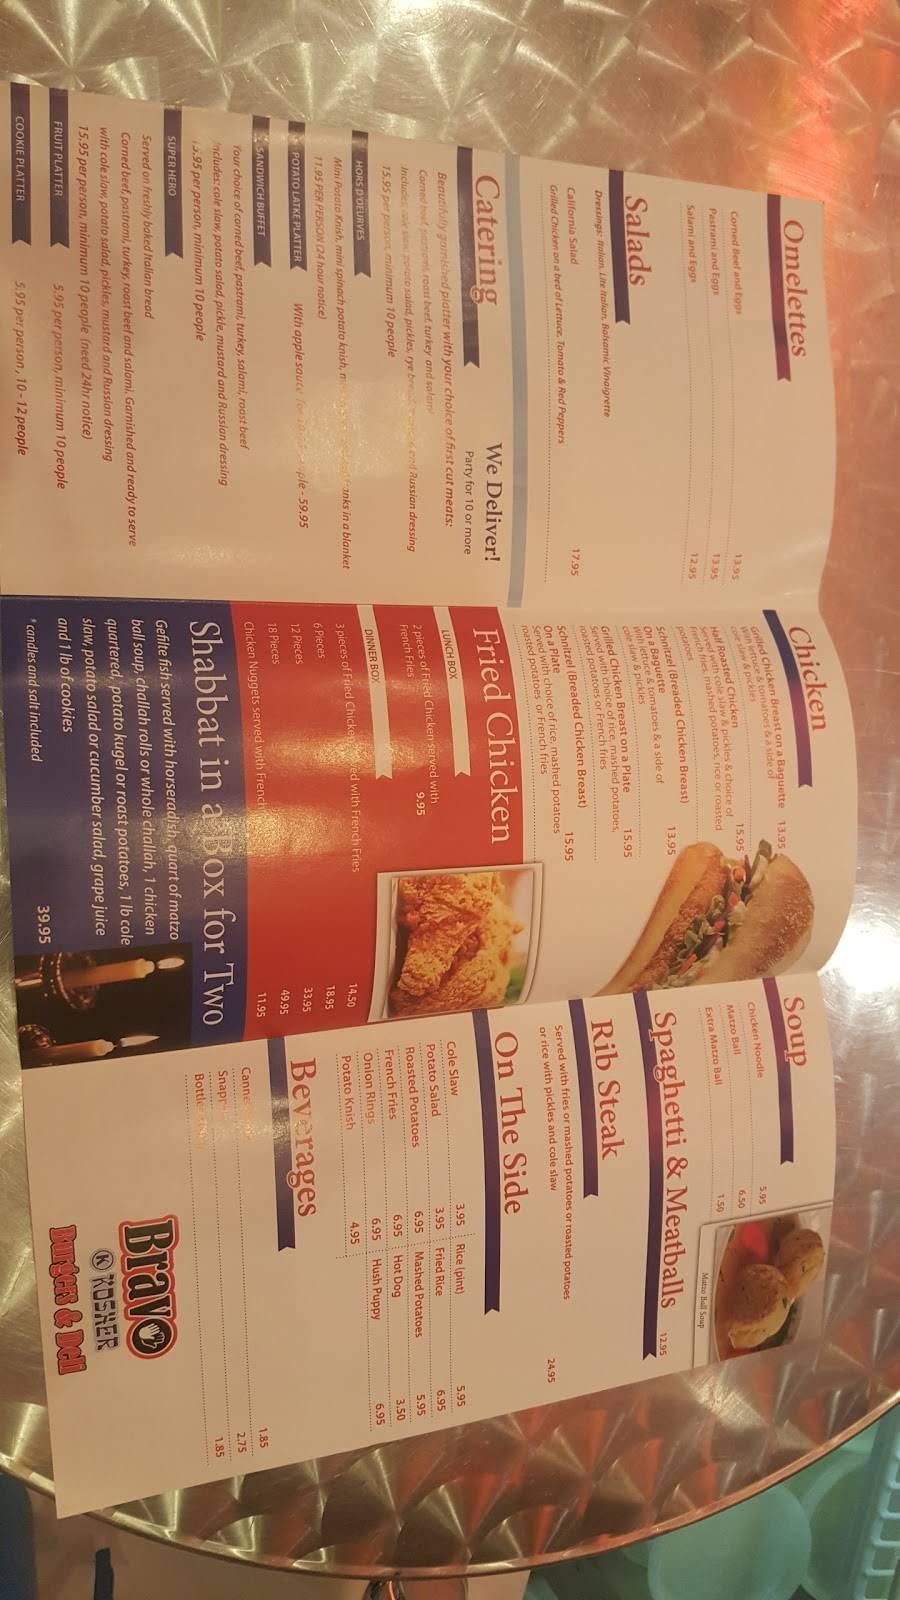 Bravo Kosher Burger and Deli | restaurant | 17A Trinity Pl, New York, NY 10006, USA | 6464499403 OR +1 646-449-9403